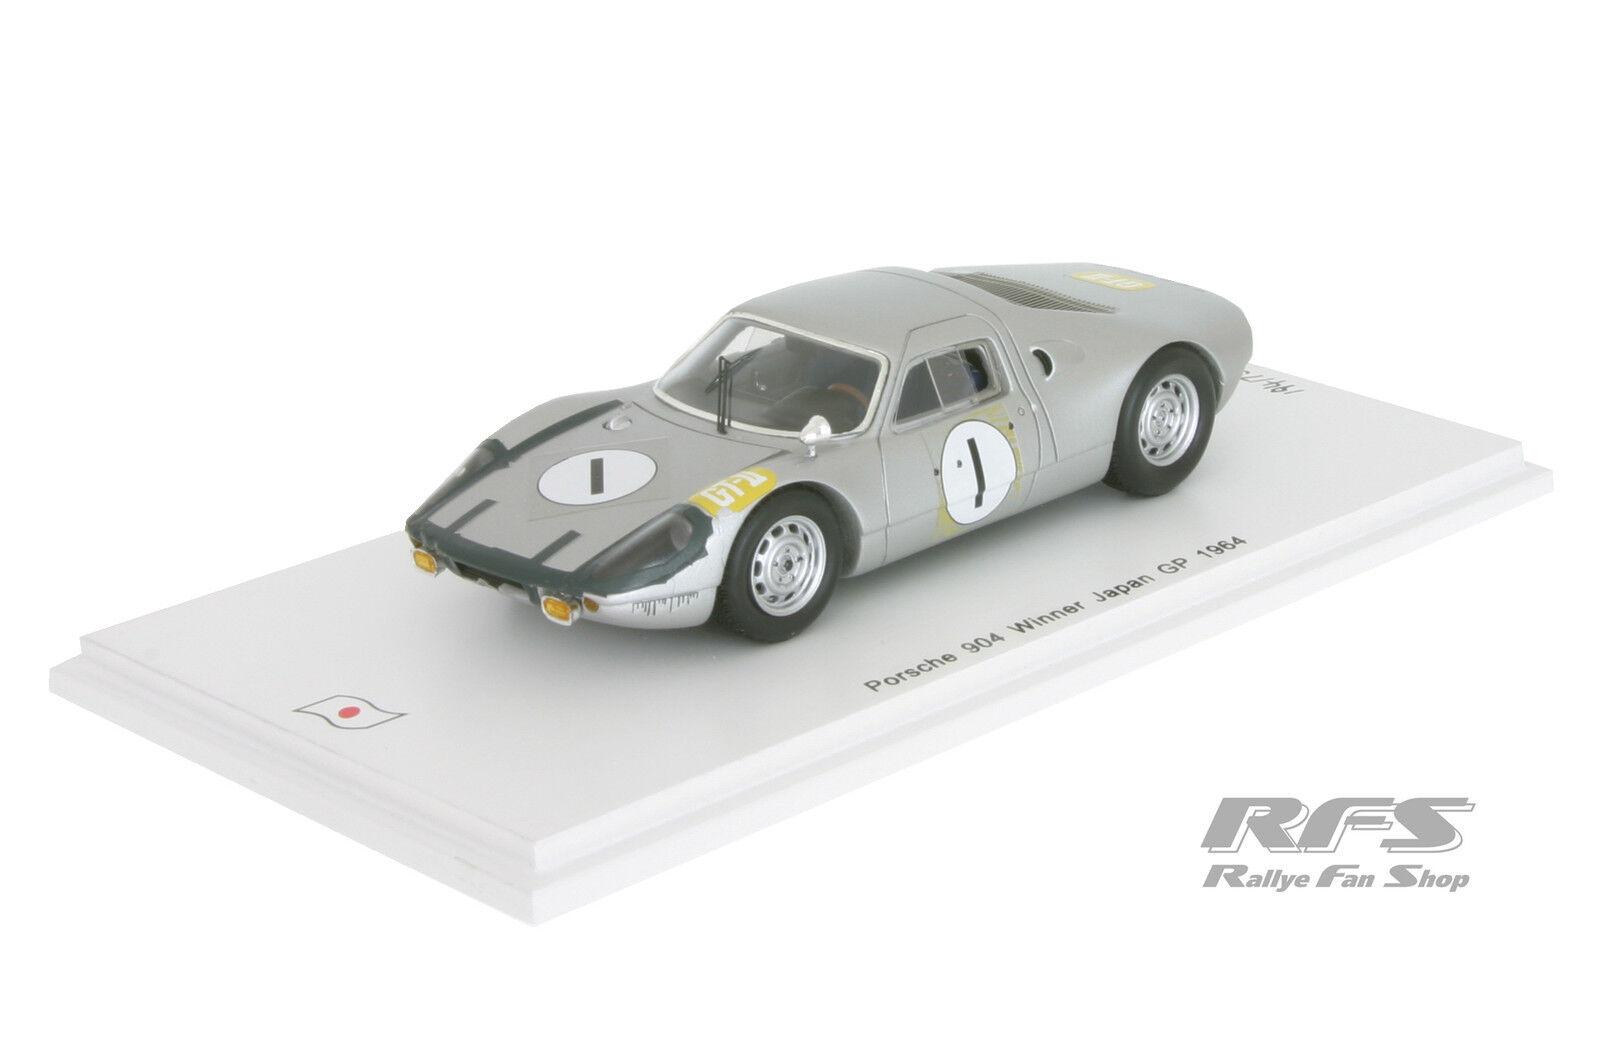 PORSCHE 904-JAPAN GP 1964 - 1 43 SPARK sj027